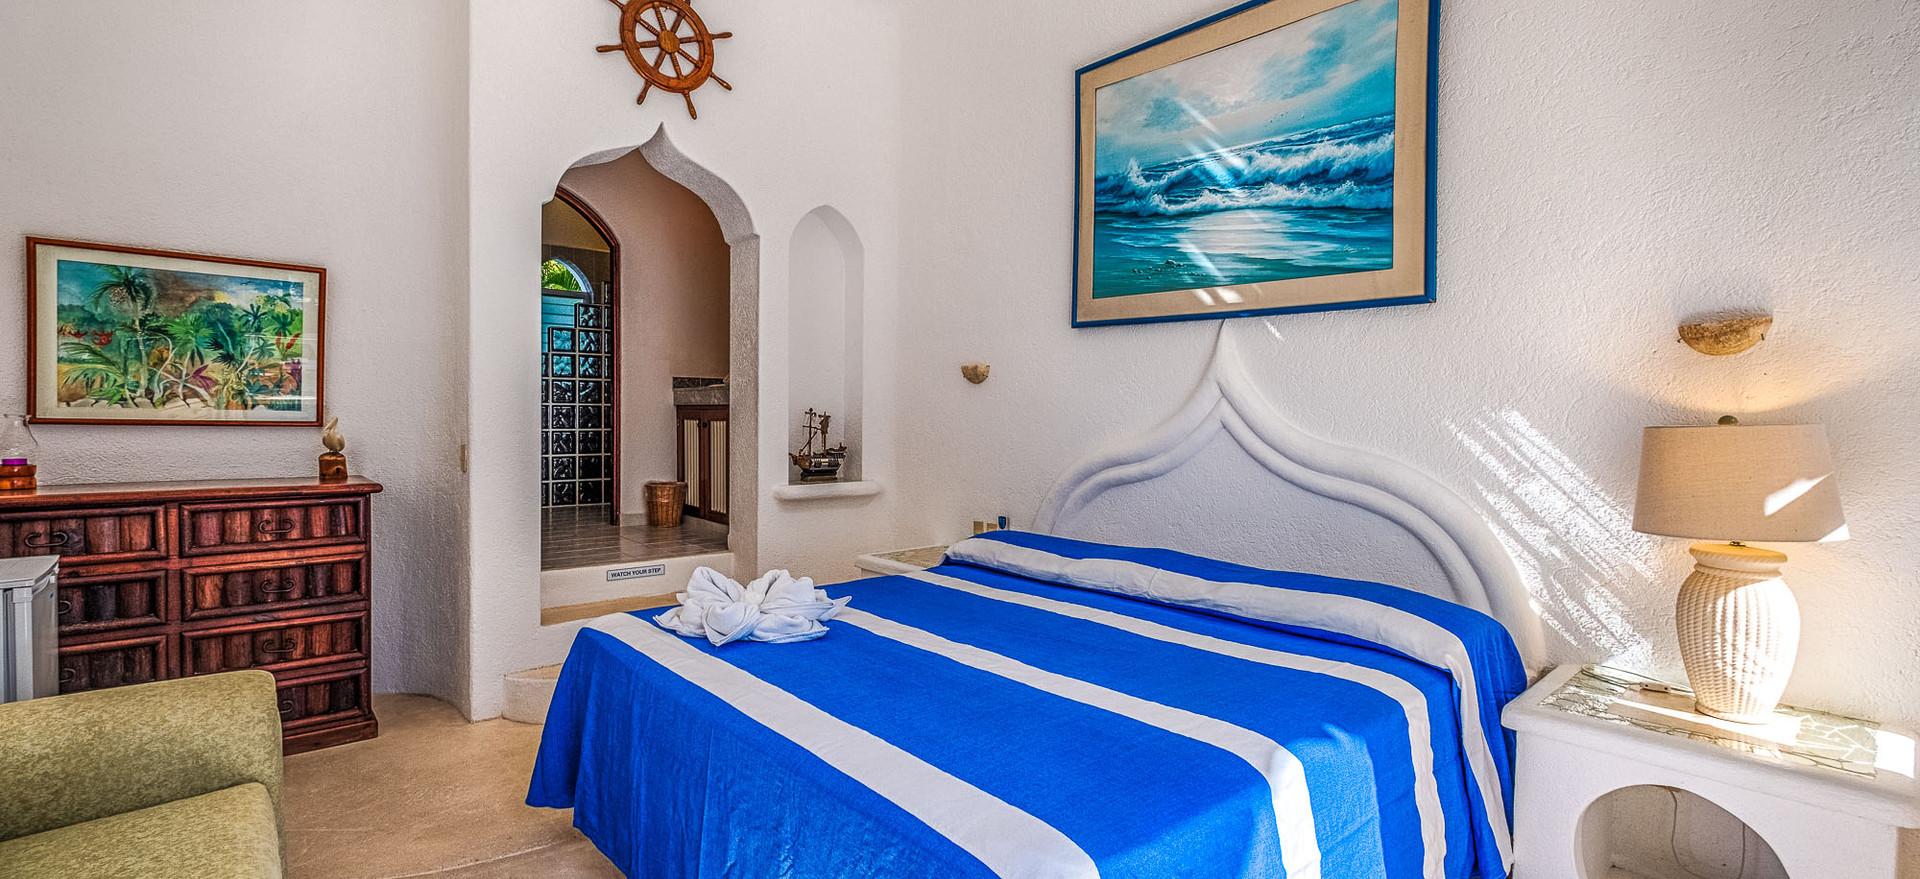 Poseidon Deluxe Suite